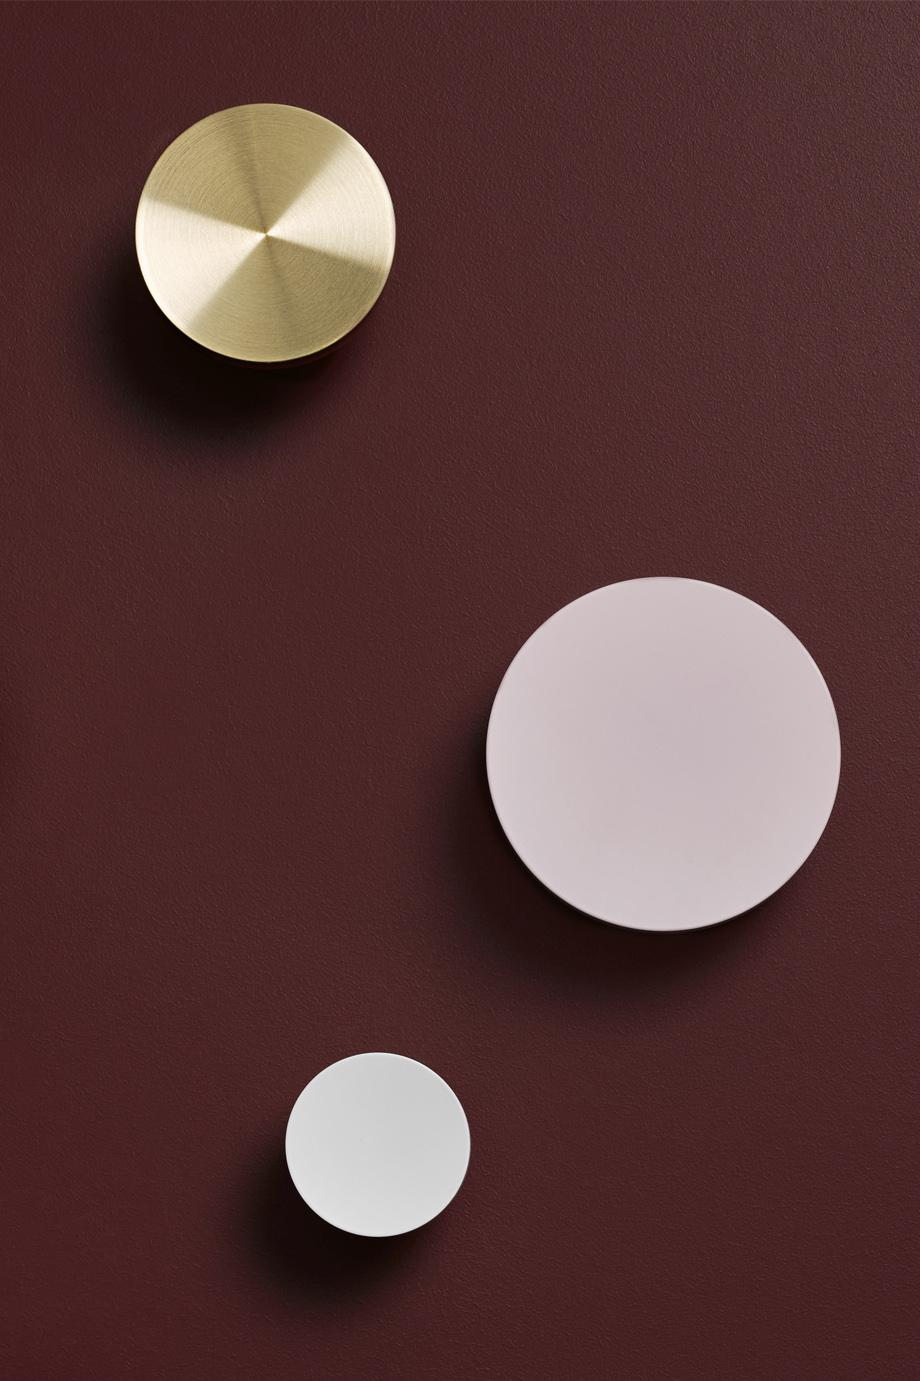 Bit Part-Brooke Holm-Megan Morton-Hooks-Brass-Pink-White.jpg